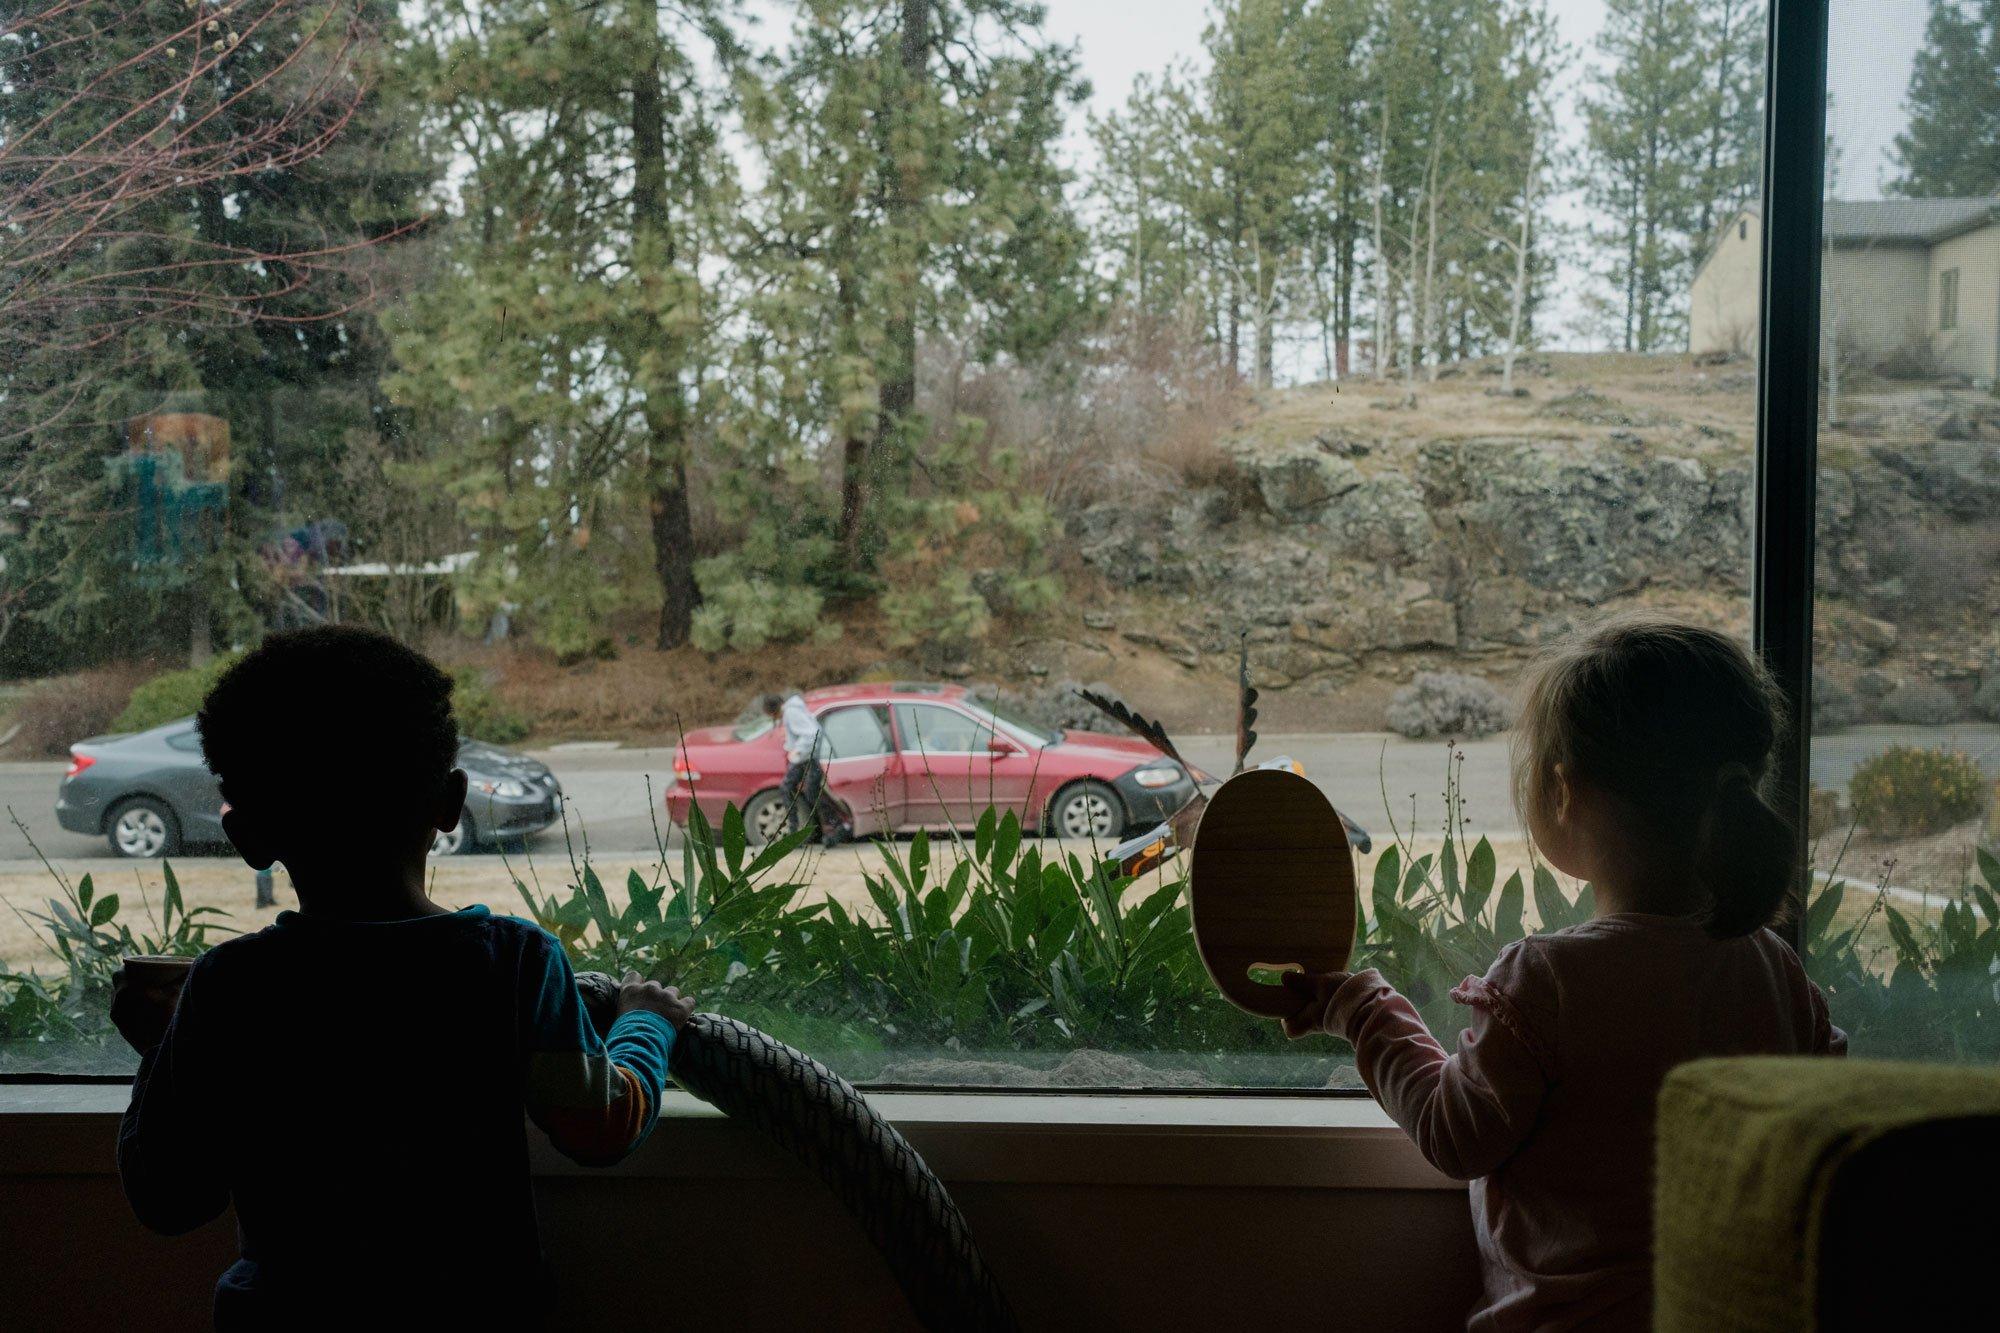 kids looking out window